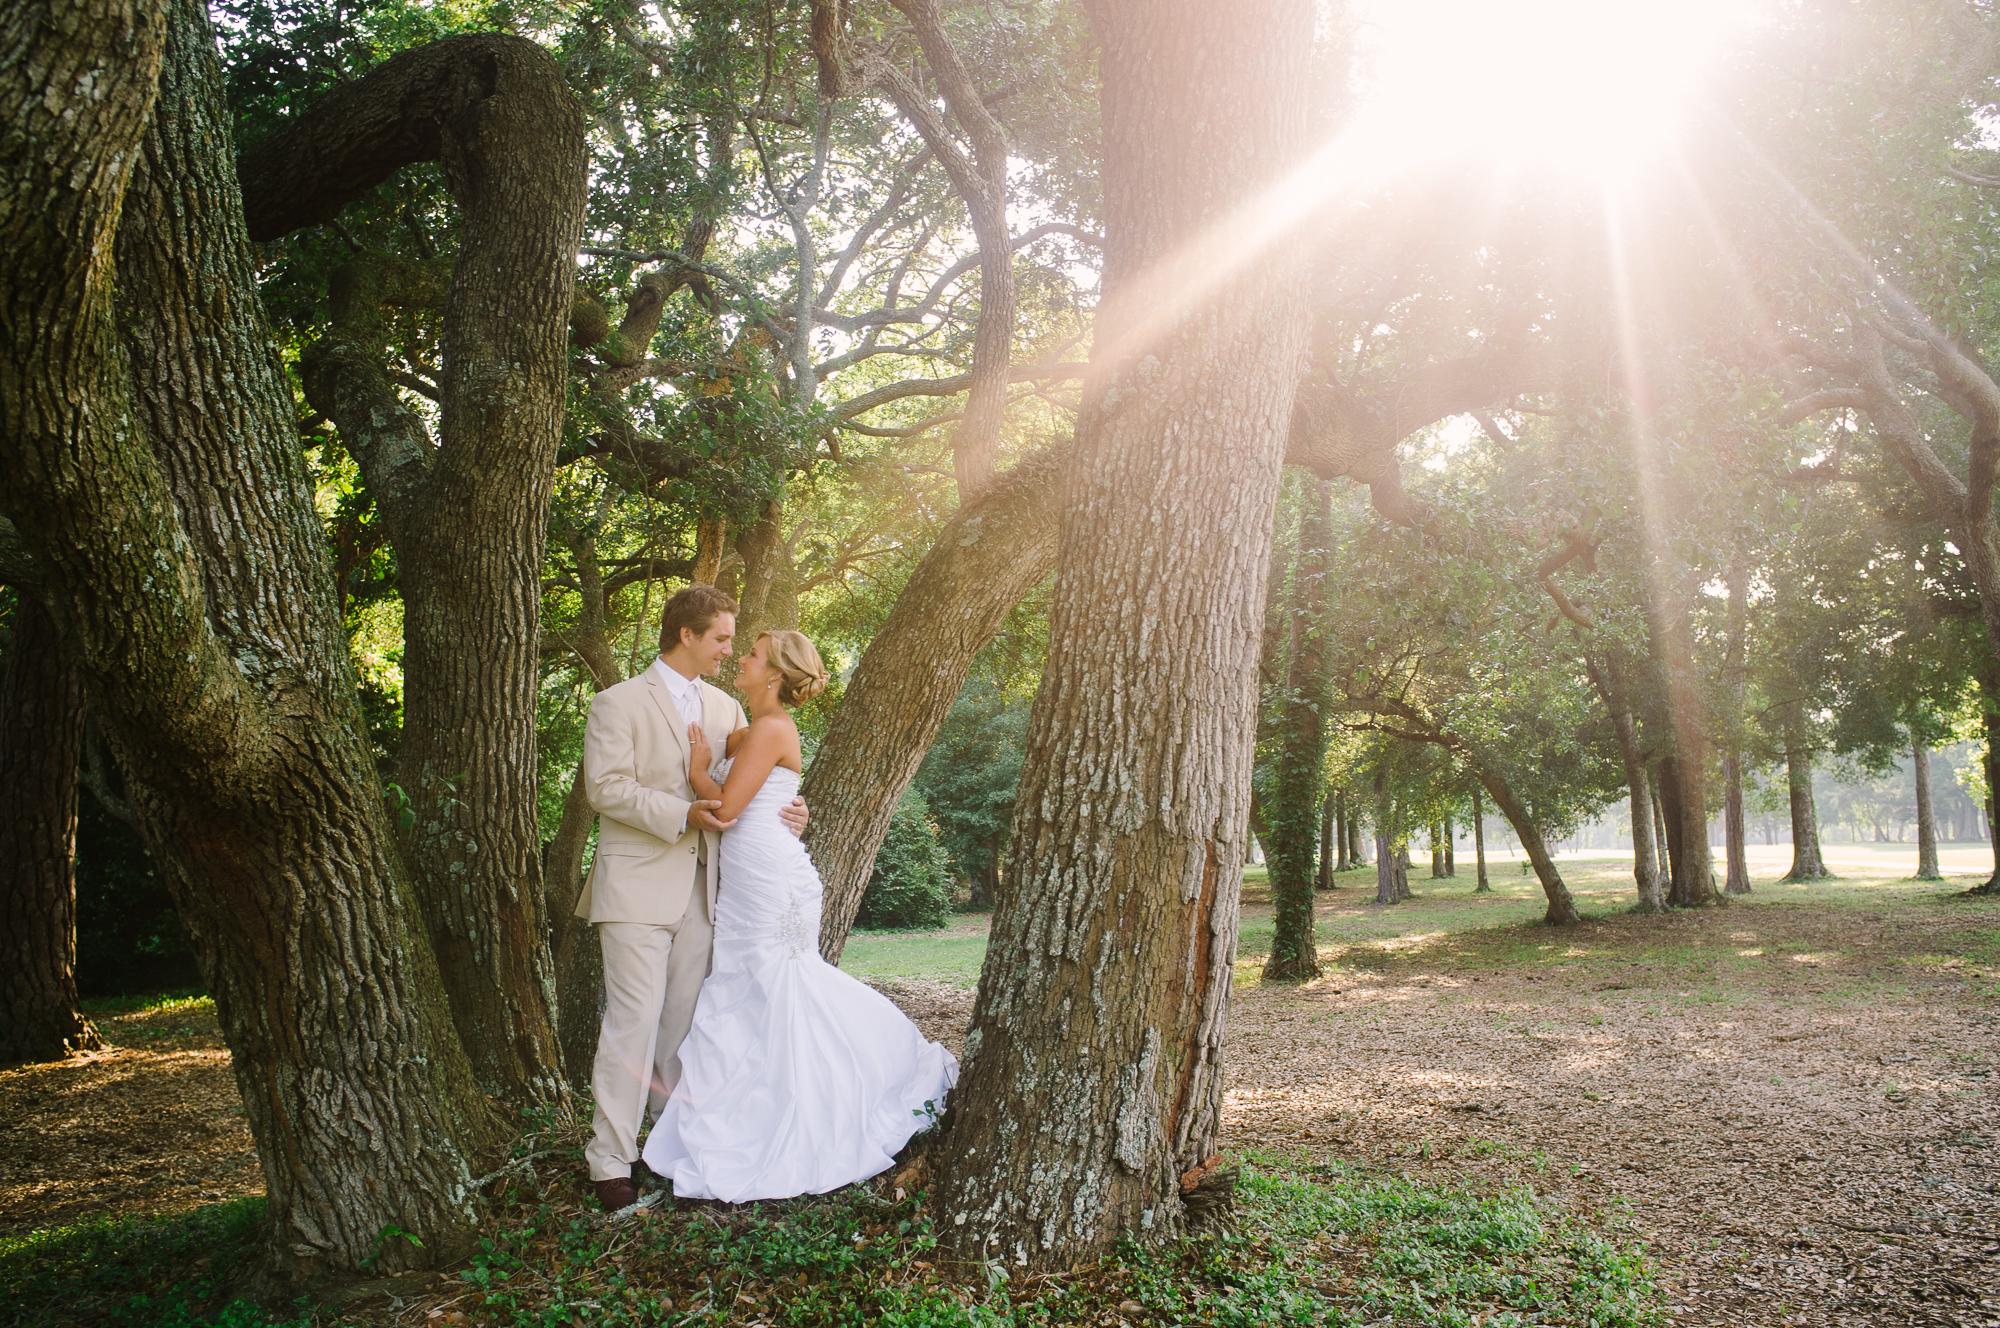 Heather-Chris-wedding-blog-29.jpg